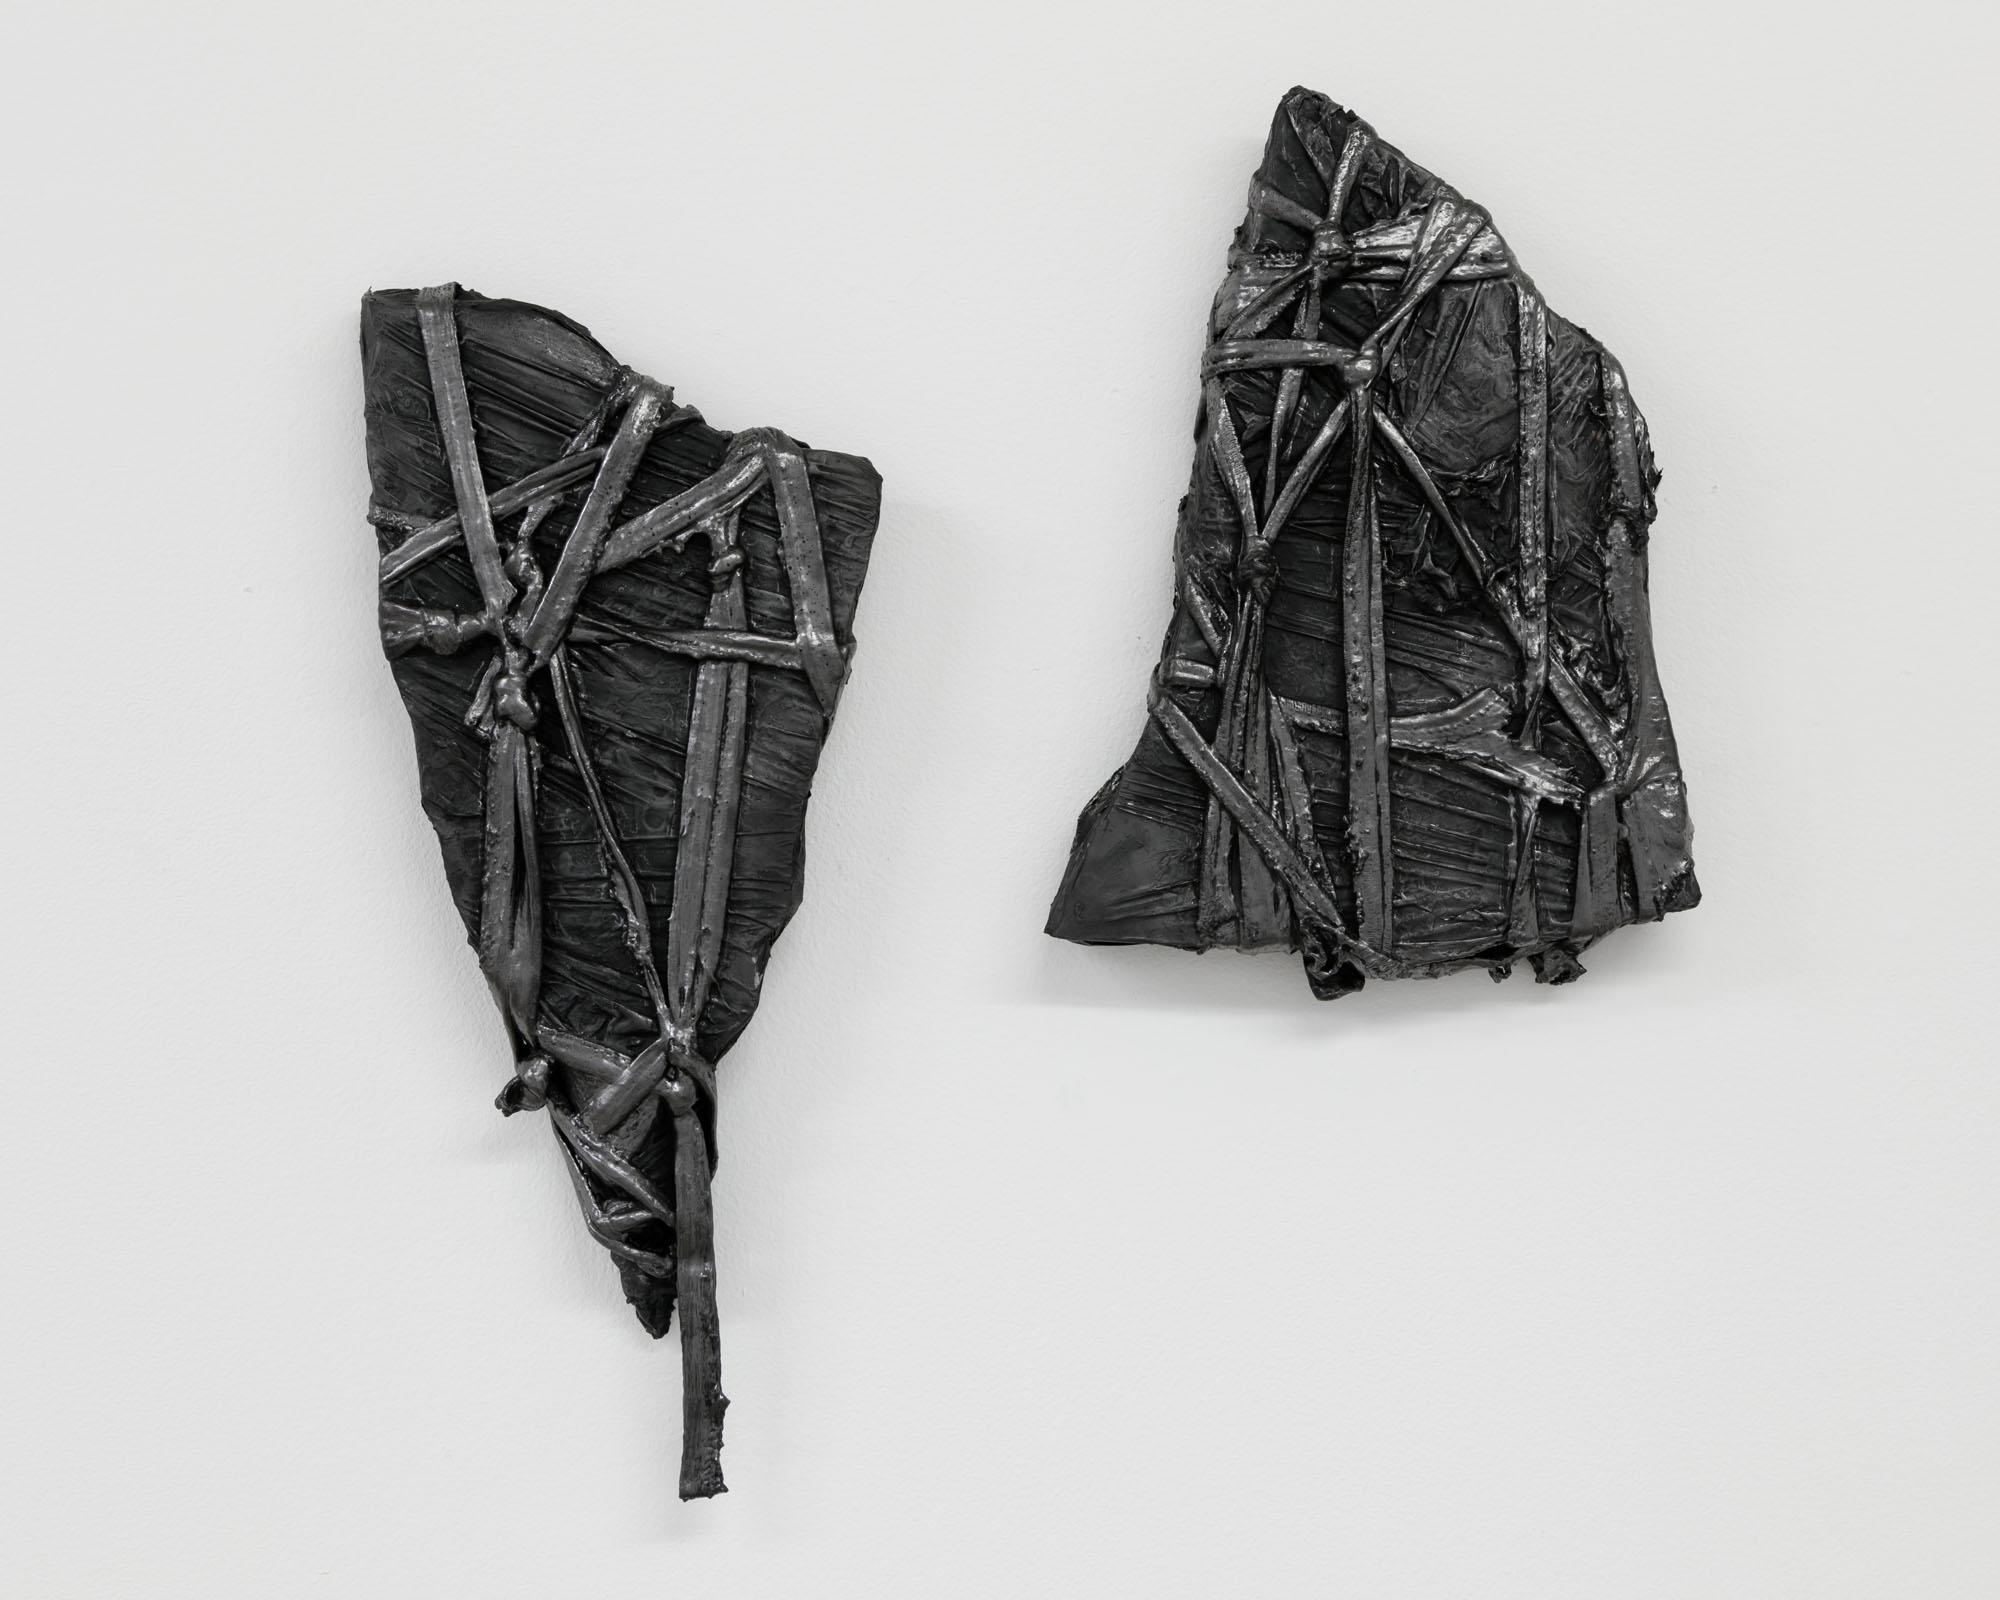 Lauren Seiden  Bound,  2019 Marble, graphite pencil, cotton, and mixed medium 14 x 6 inches (35.56 x 15.24 cm)